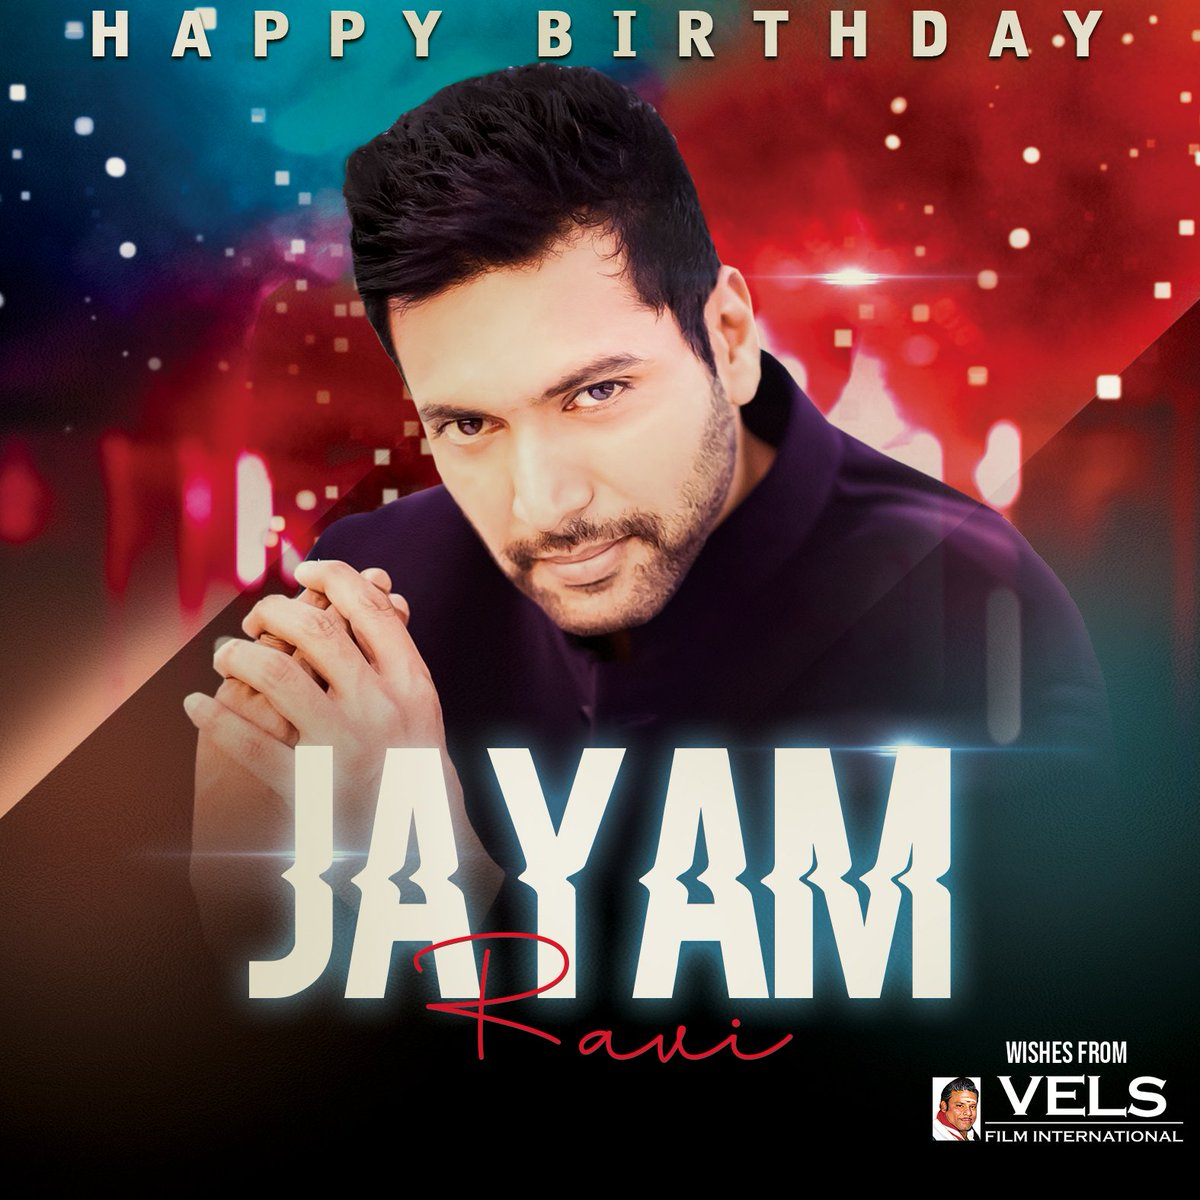 .@VelsFilmIntl Wishing the Spectacular & Versatile @actor_jayamravi a very Happy Birthday 🥳 இனிய பிறந்தநாள் வாழ்த்துக்கள்!  #HappyBirthdayJayamRavi #HBDJayamRavi https://t.co/ERUcuoal50